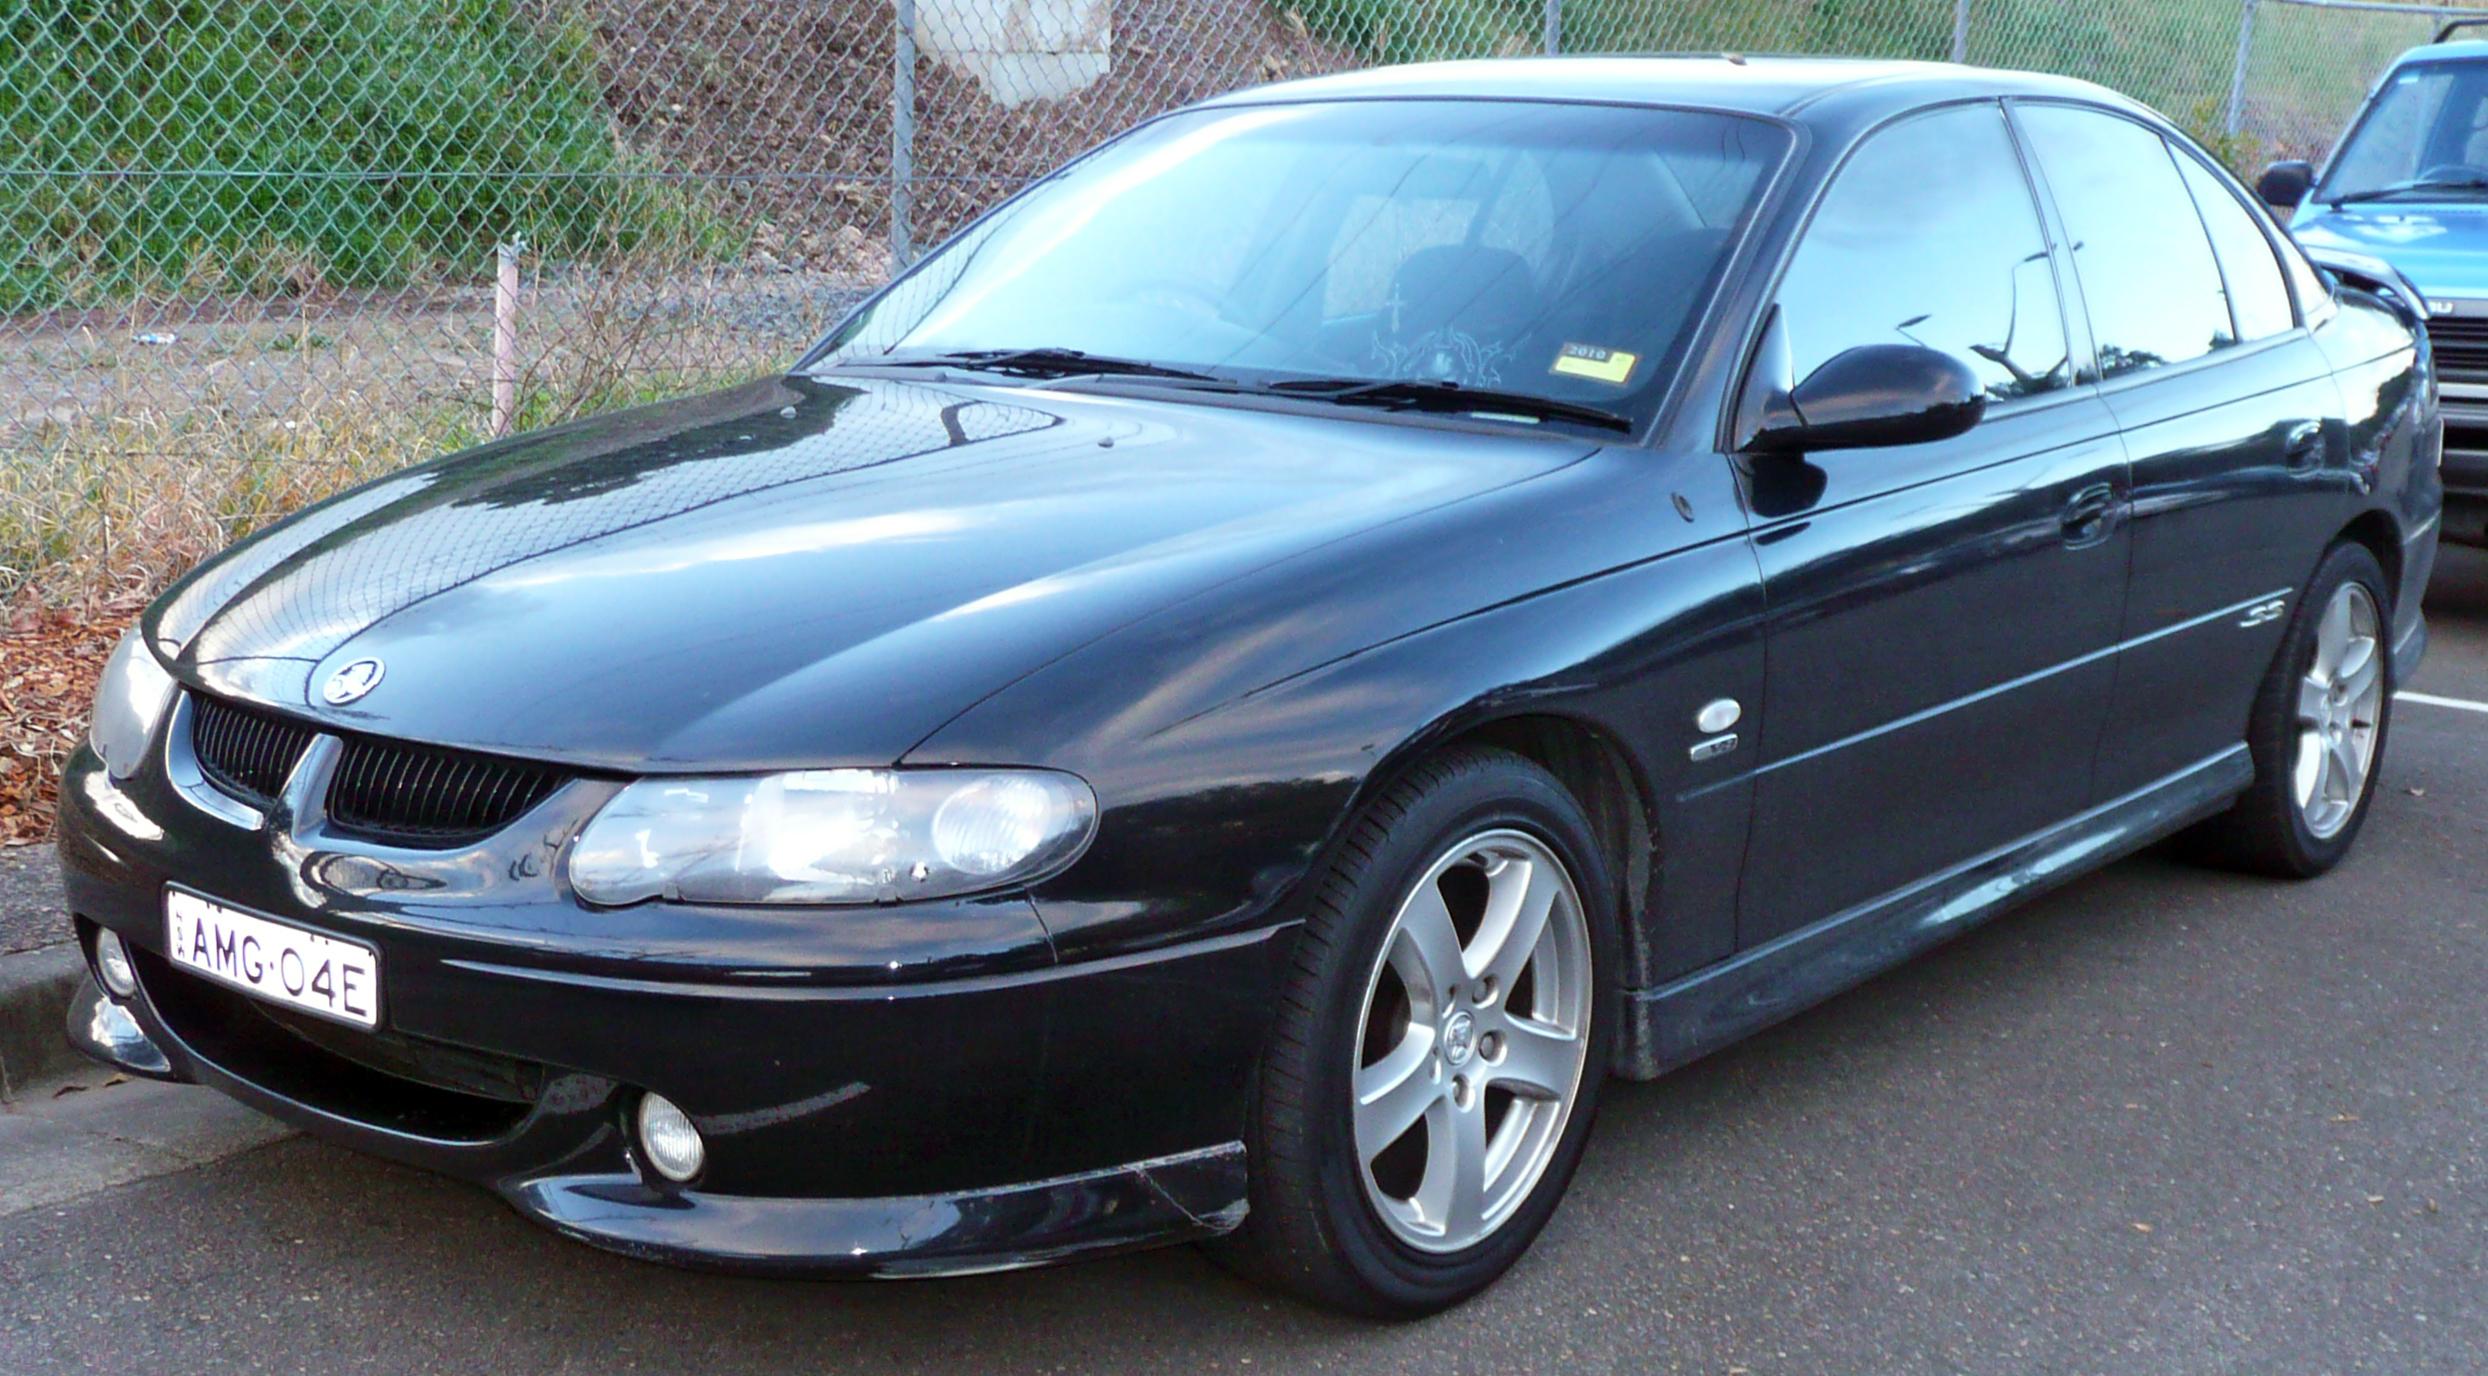 File 2001 2002 Holden Vx Ii Commodore Ss Sedan 02 Jpg